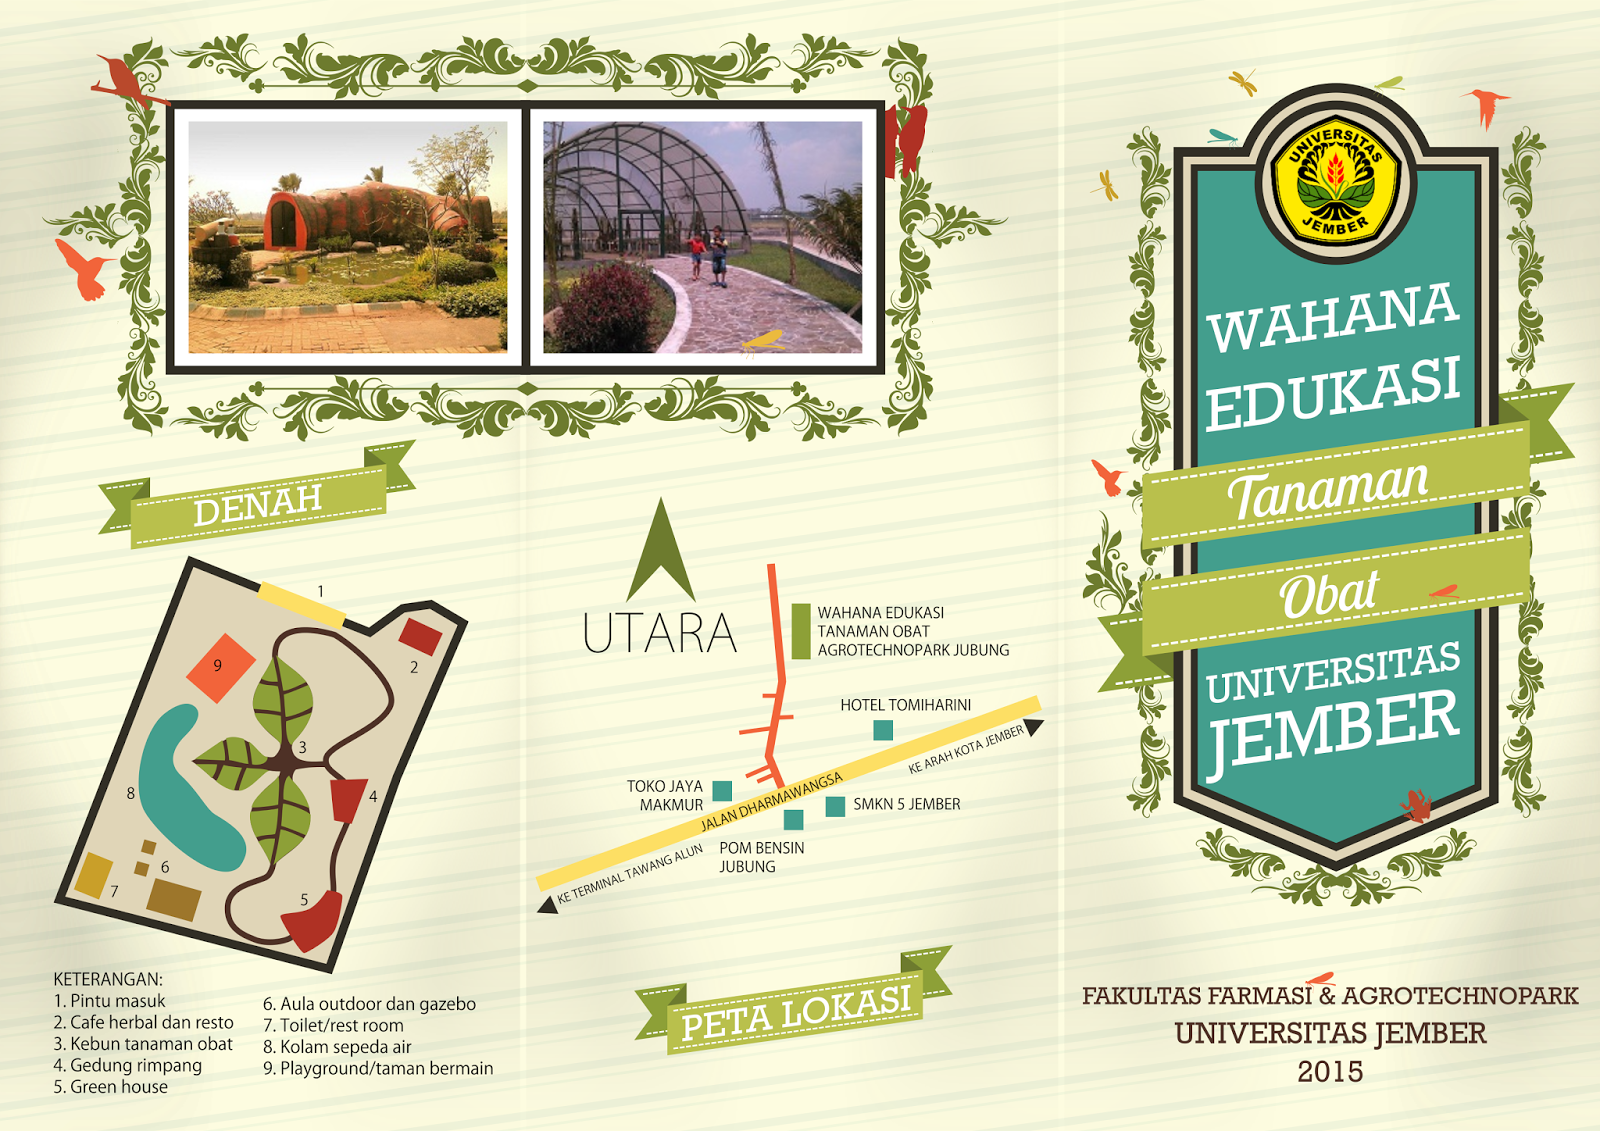 UNEJ, Universitas Jember, Herbal Medicine, Tanaman Obat UNEJ, Agroteknopark UNEJ